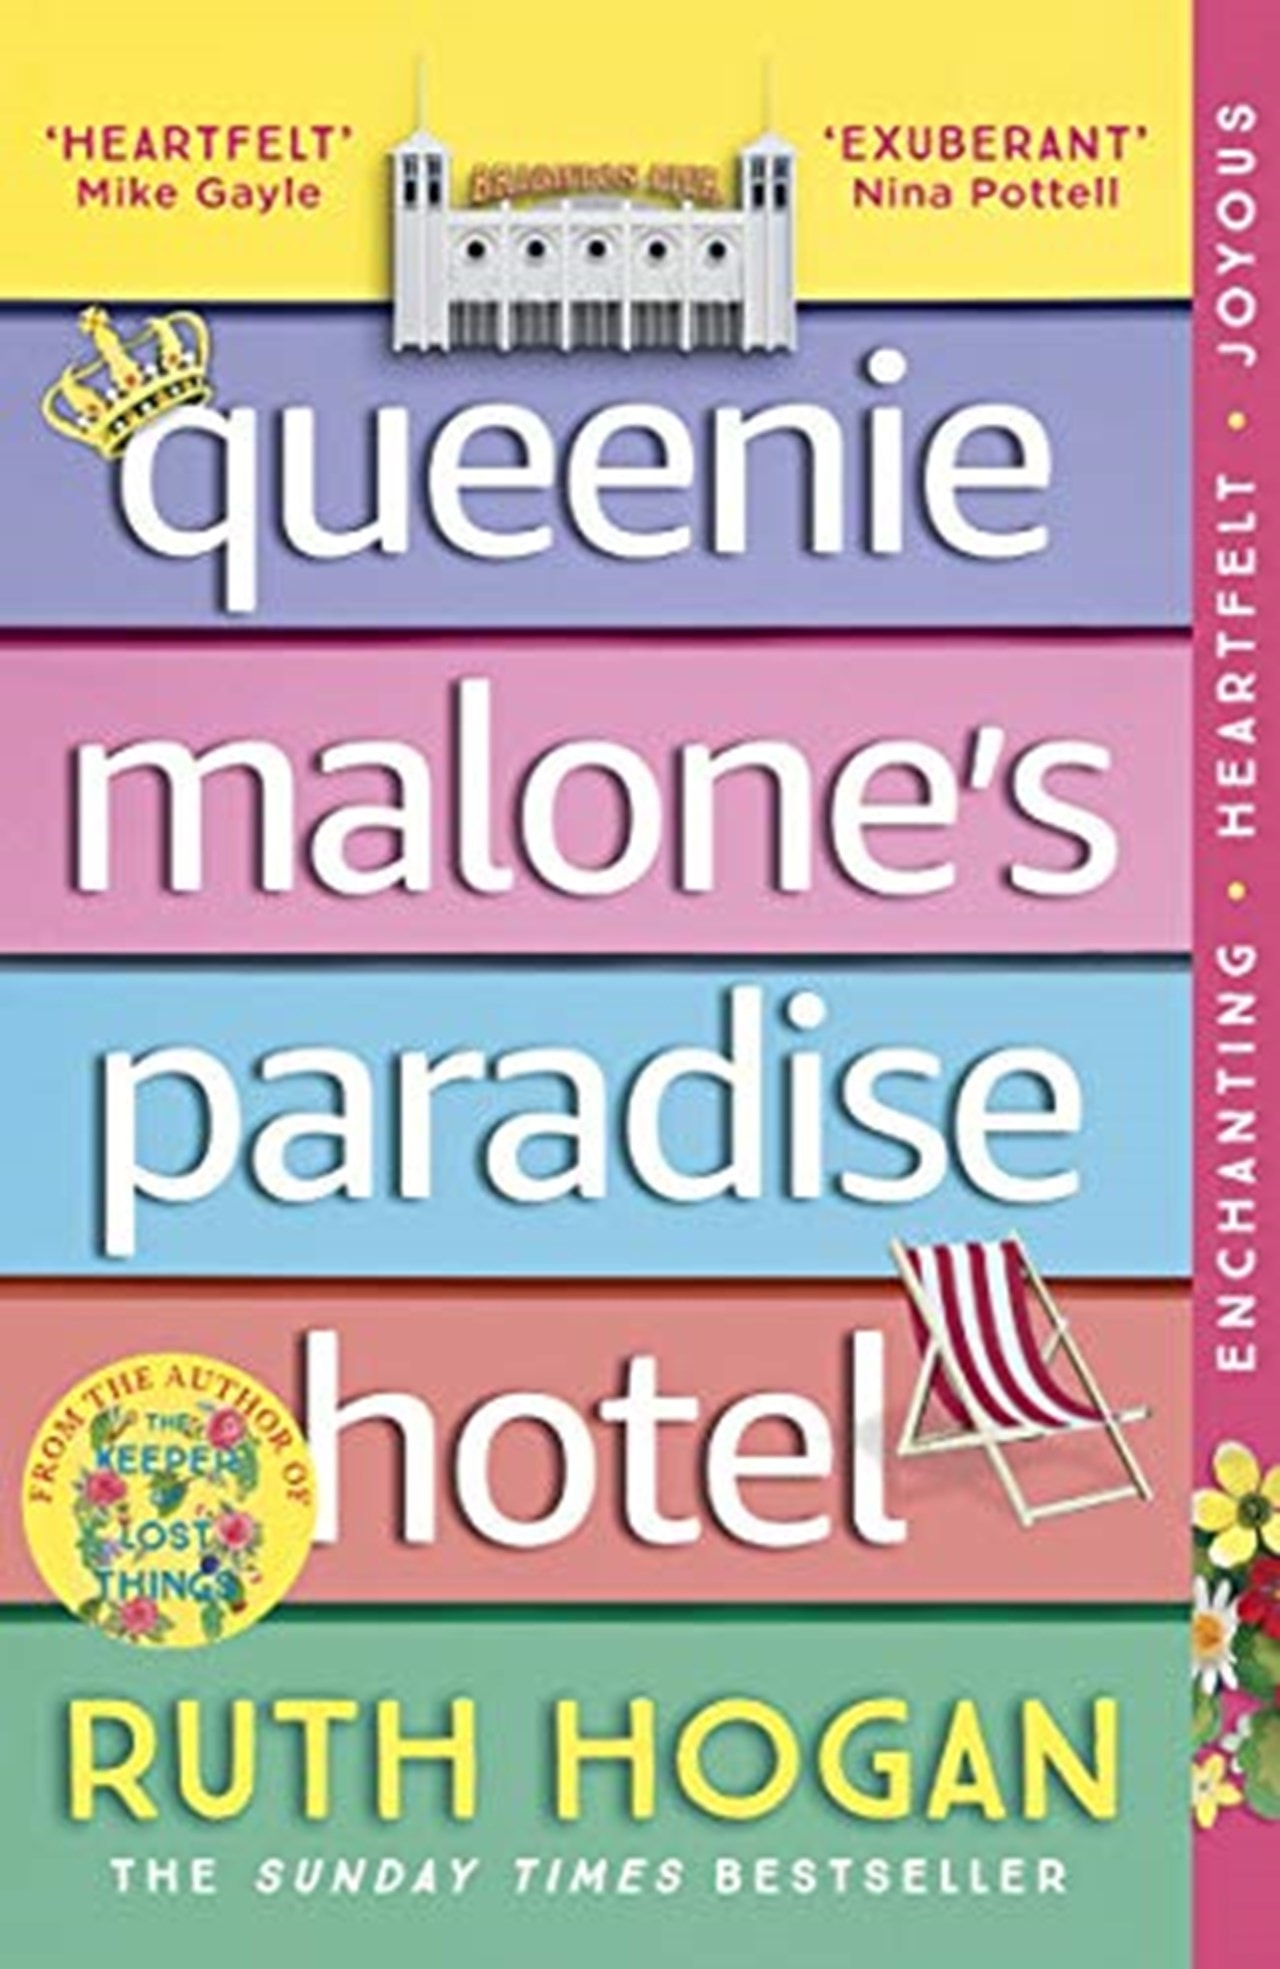 Queenie Malone's Paradise Hotel - 1